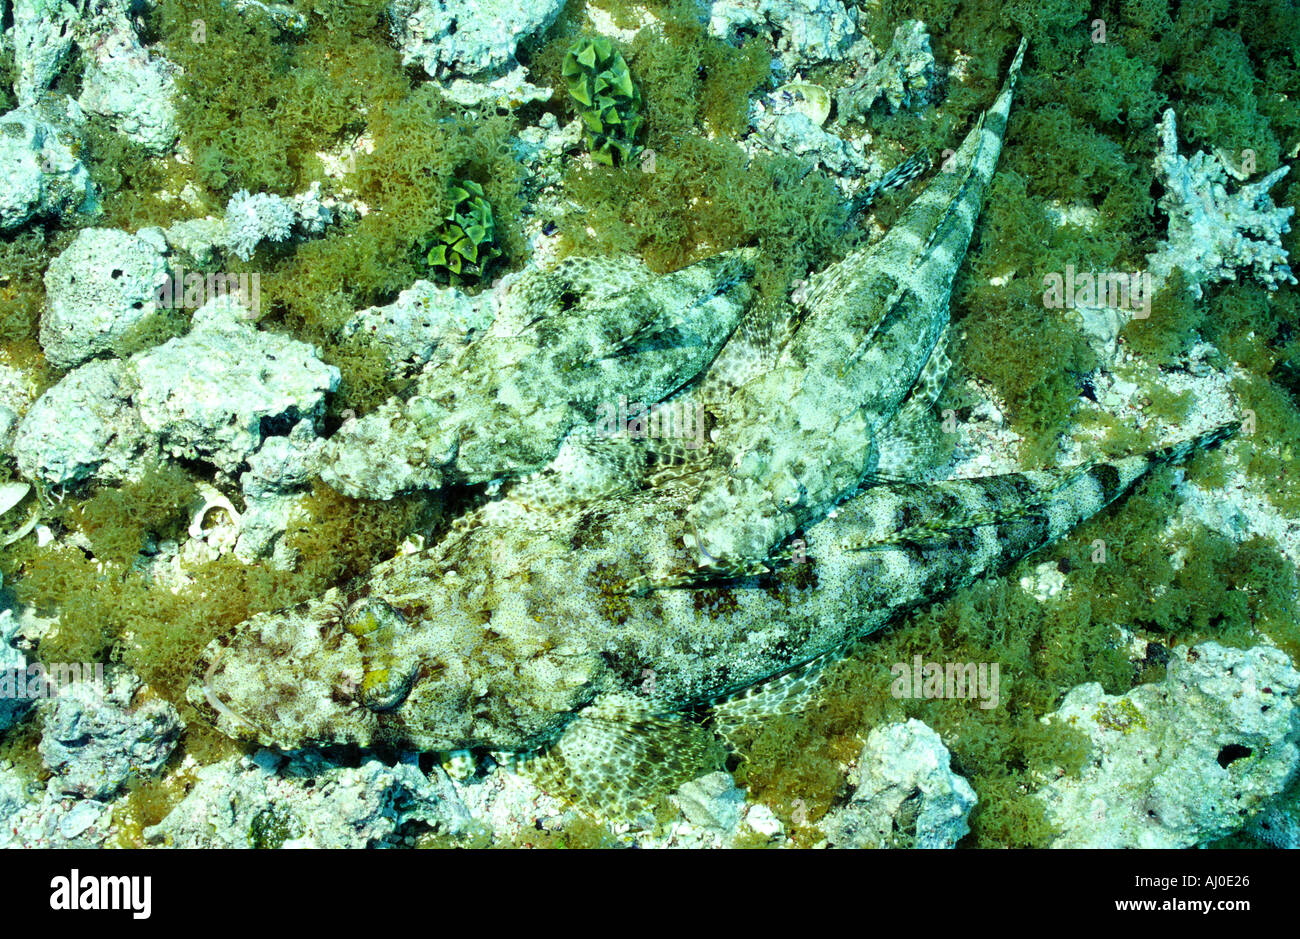 Crocodile fish in the wild. - Stock Image